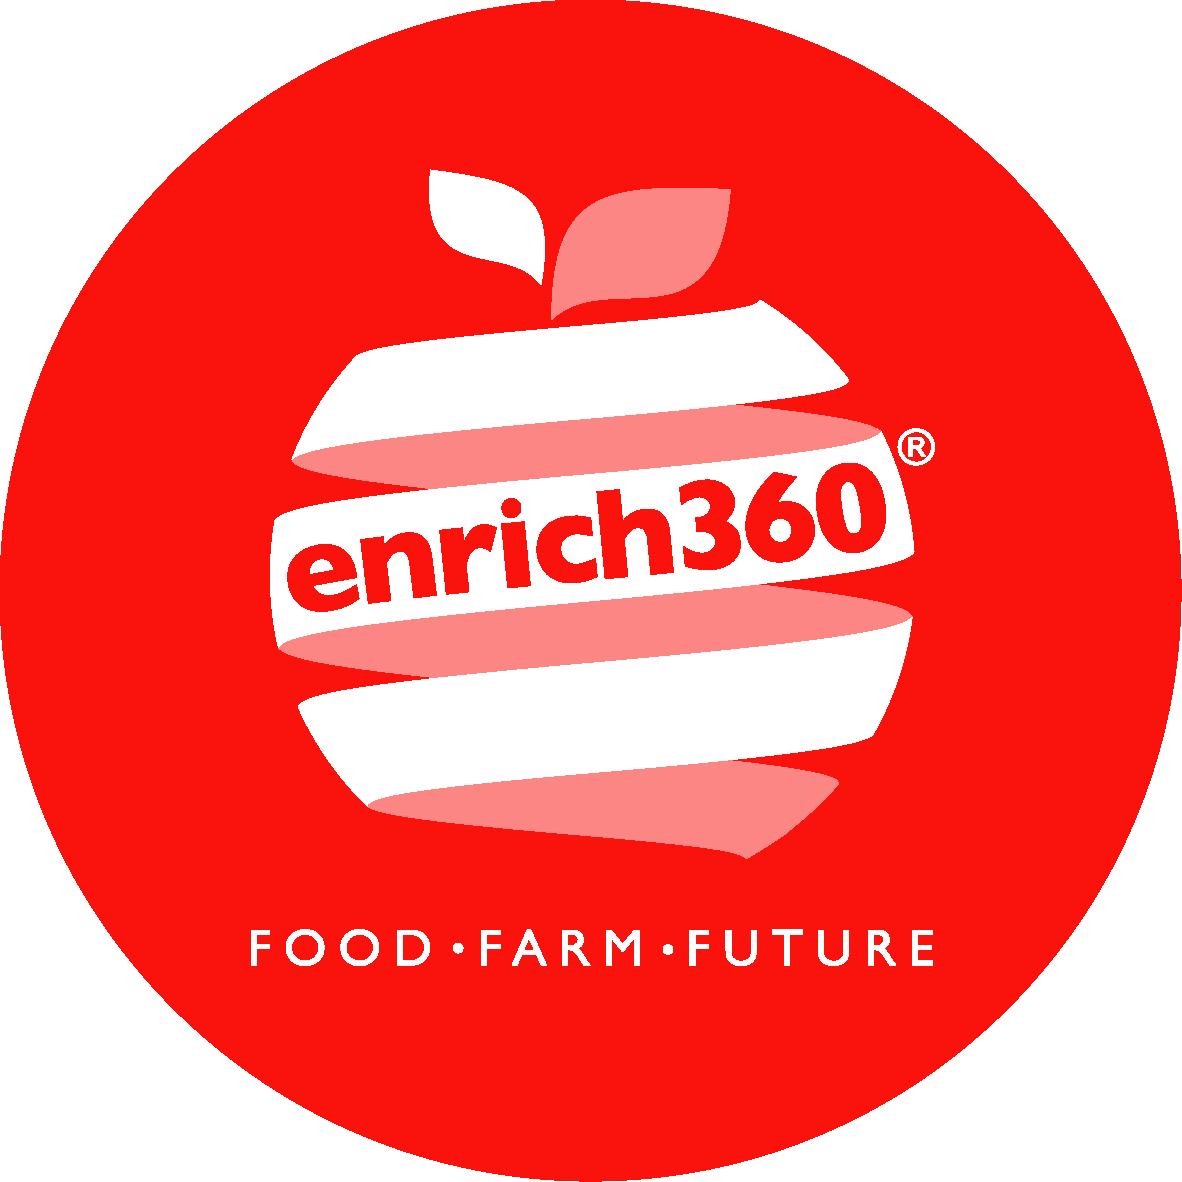 enrich360 – FOOD   FARM   FUTURE